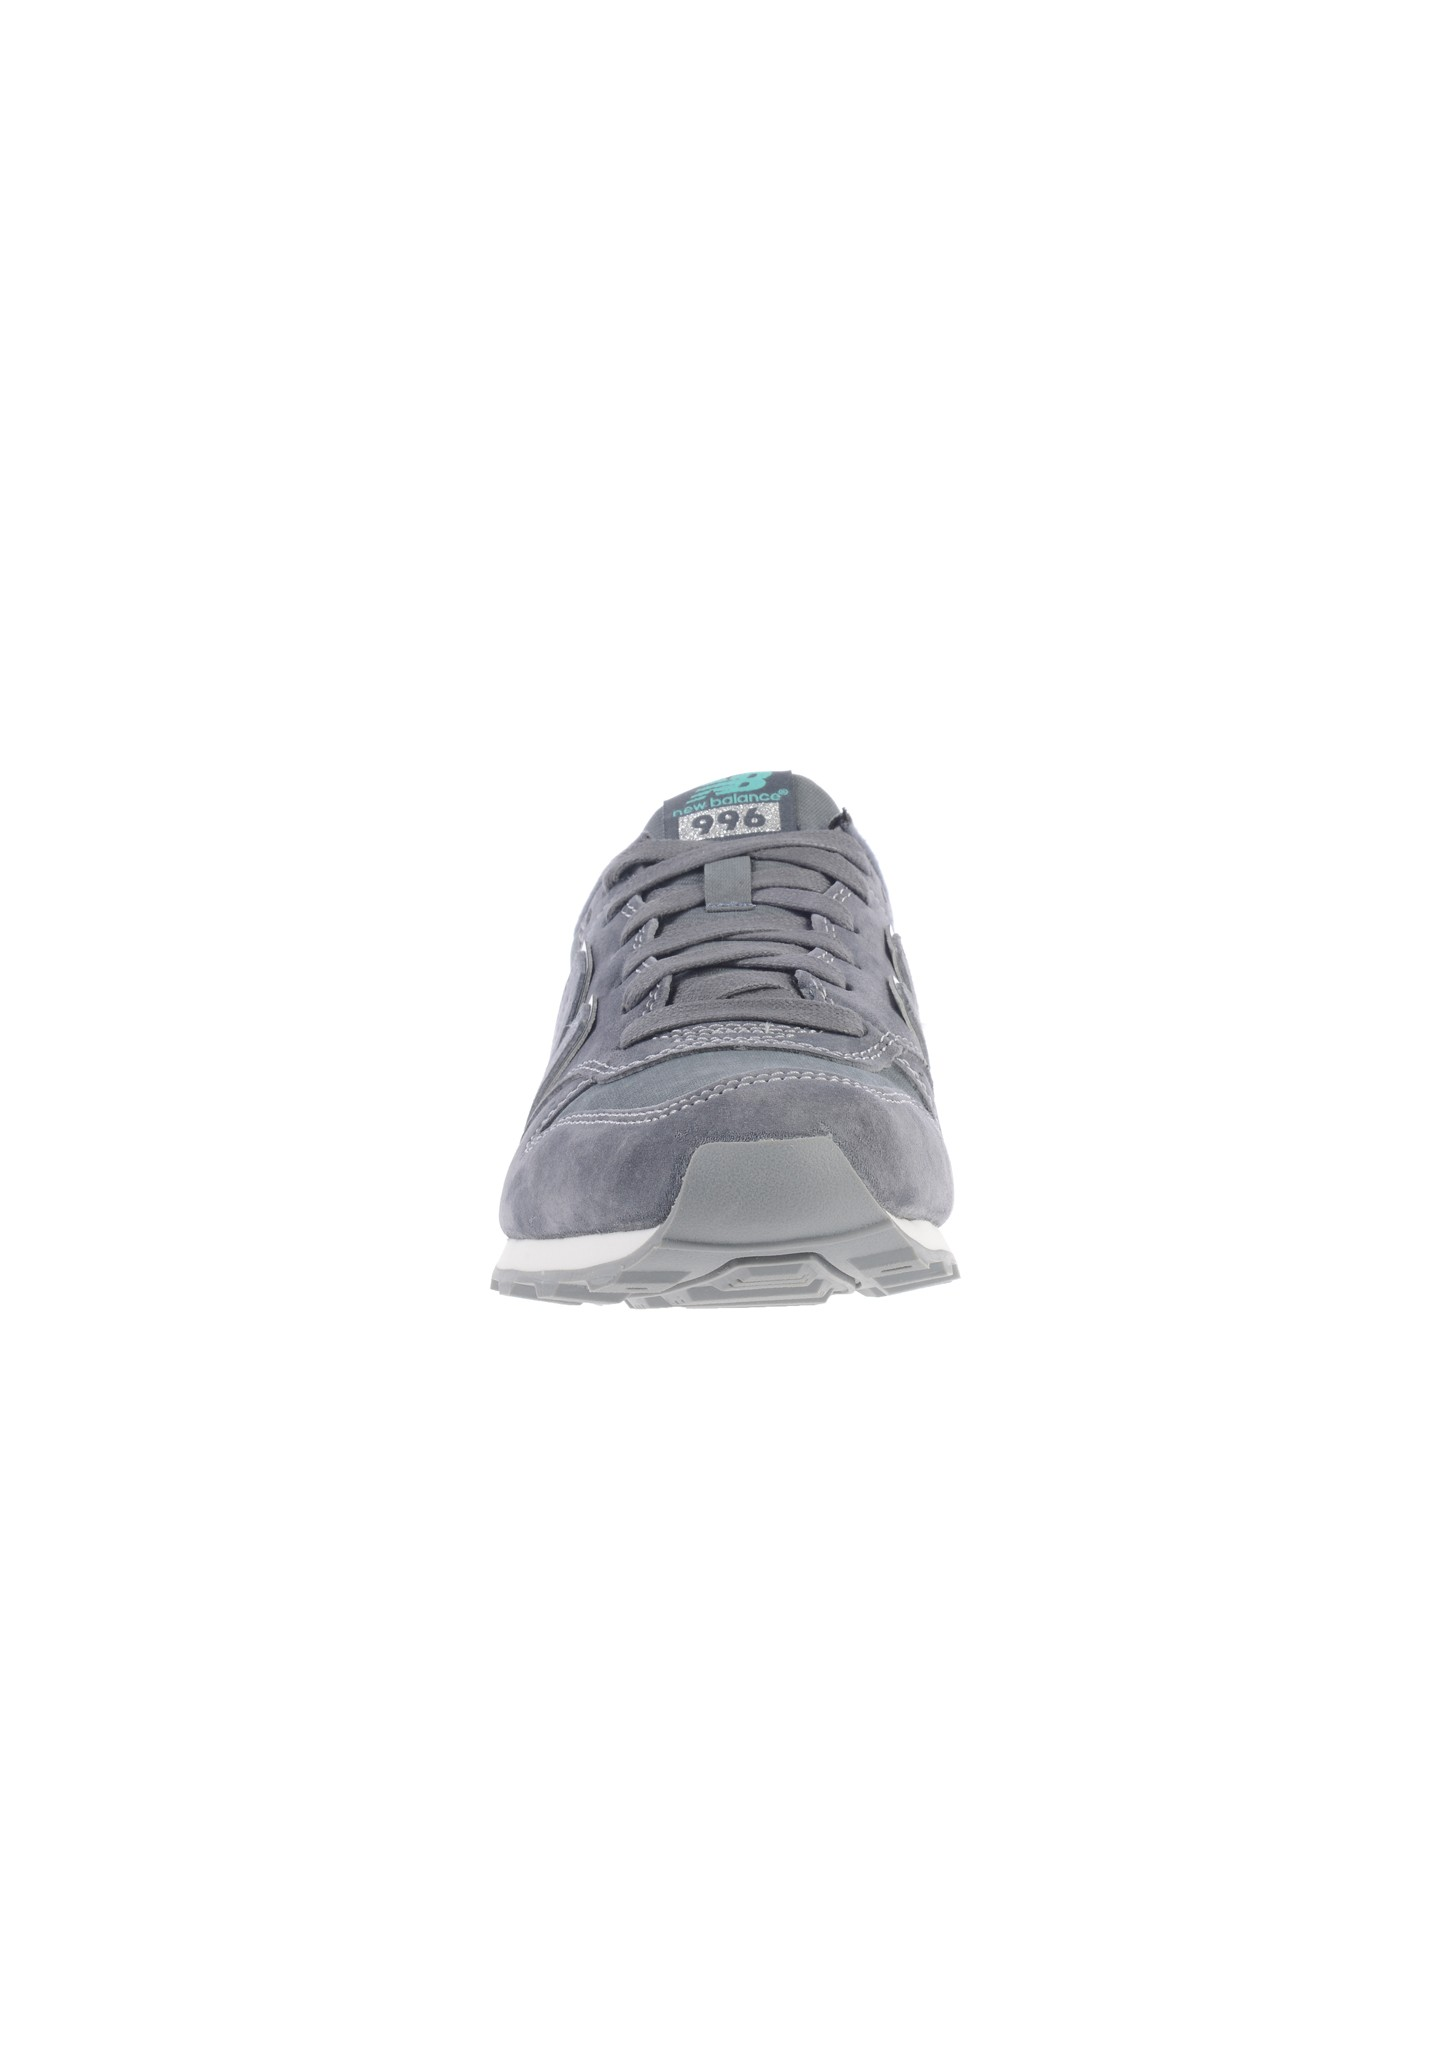 NEU NEW BALANCE WR996 Damen Sneaker Turnschuhe Freizeit Schuhe Sneakers